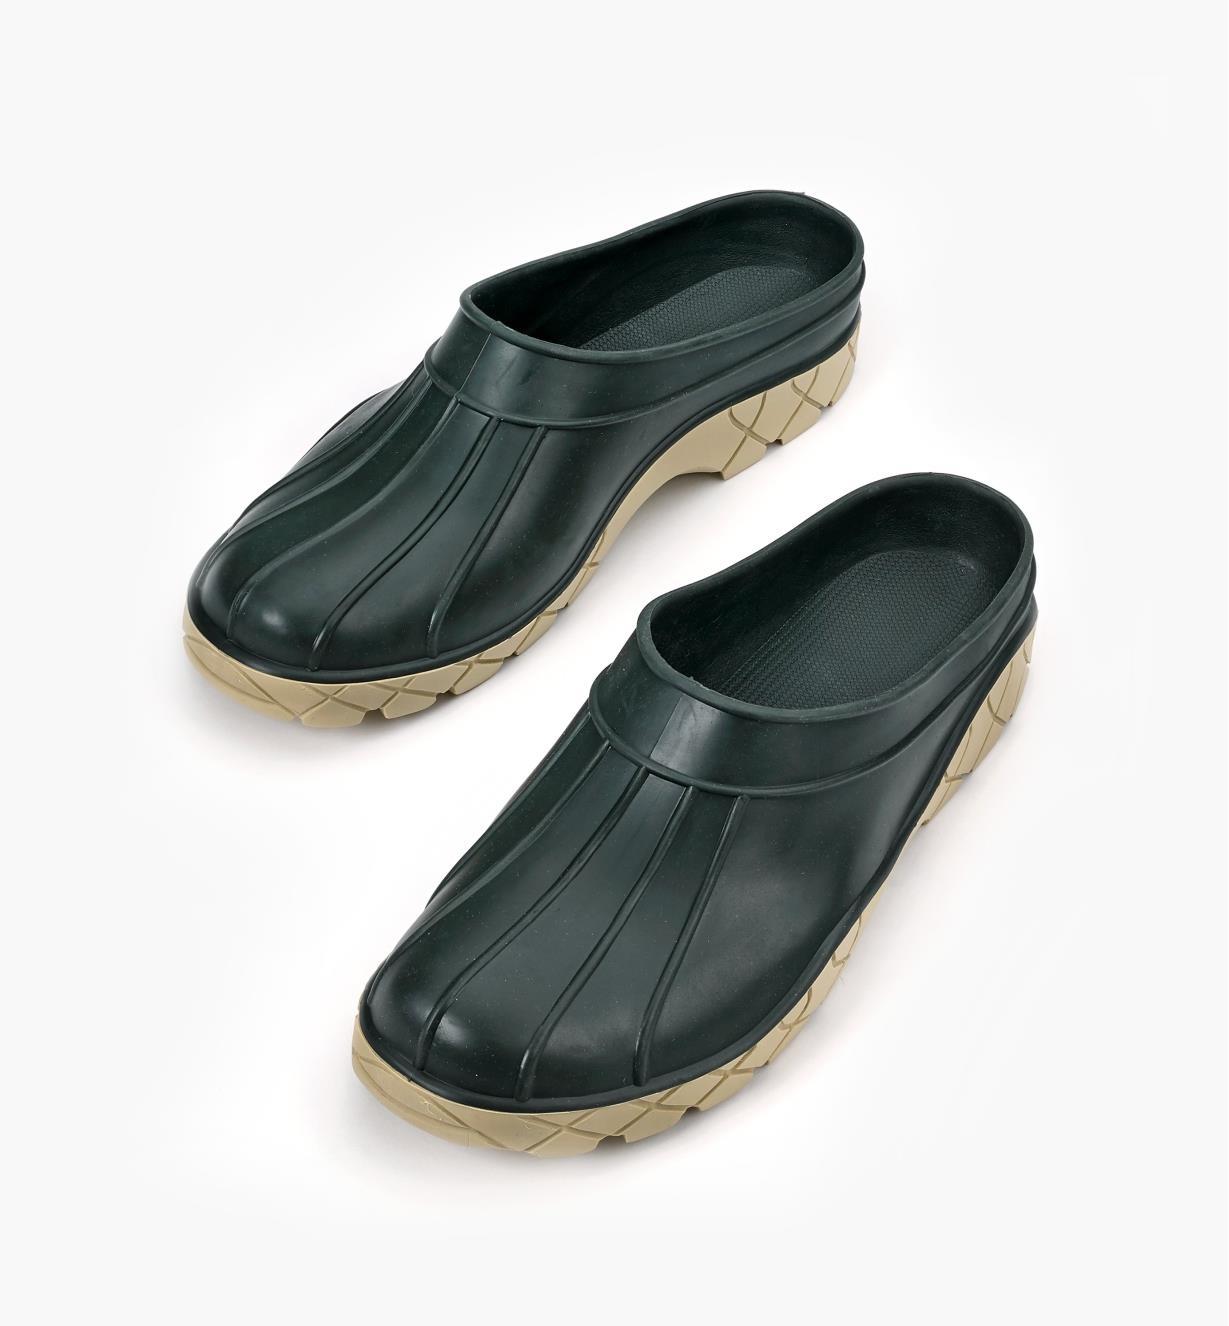 Baffin Clogs